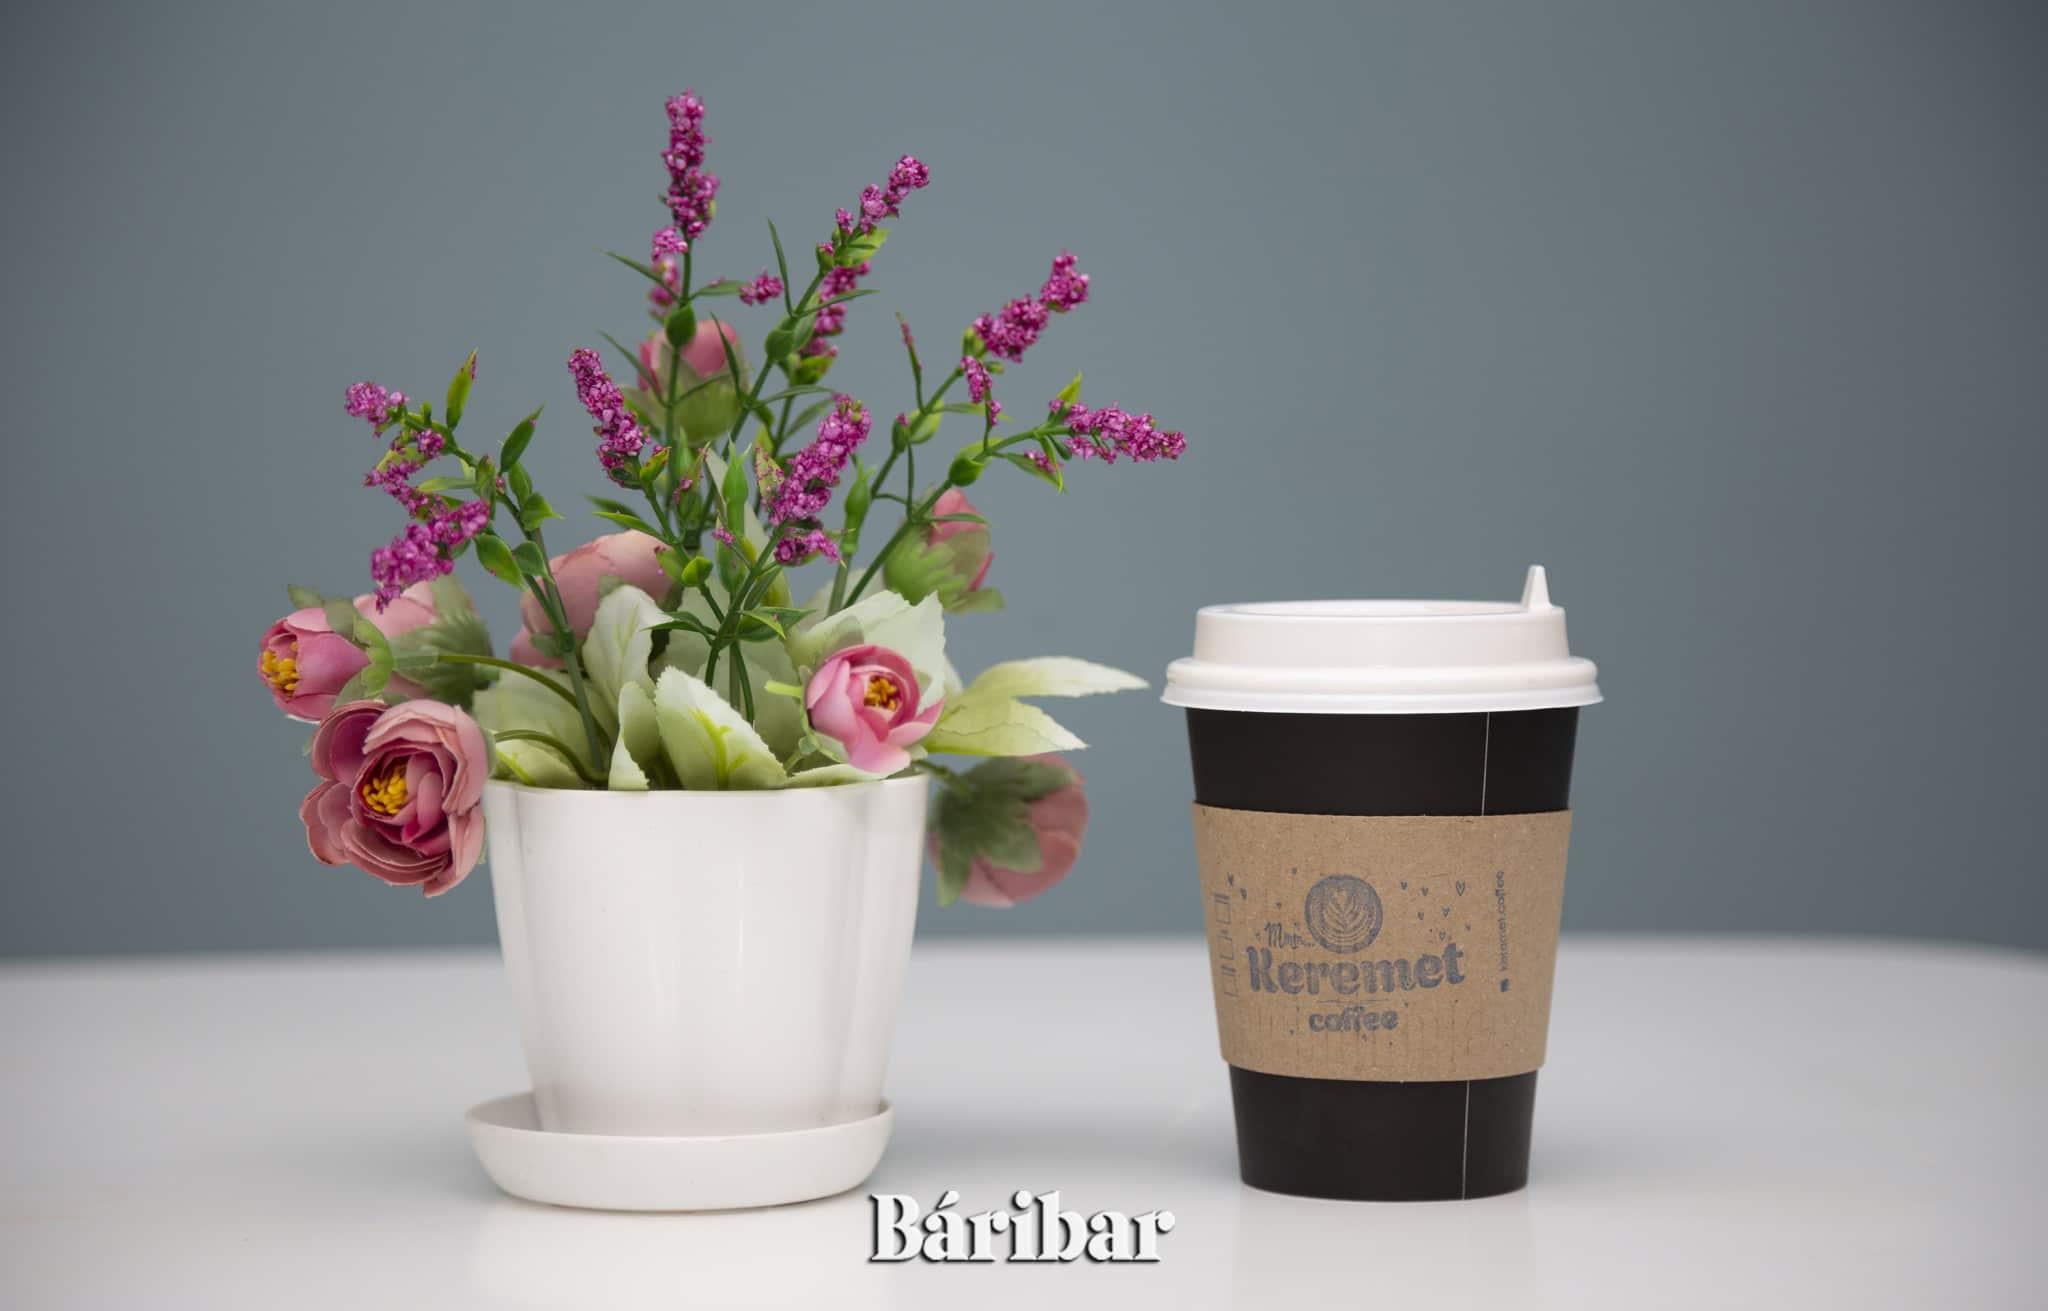 Keremet coffee кофеханасы